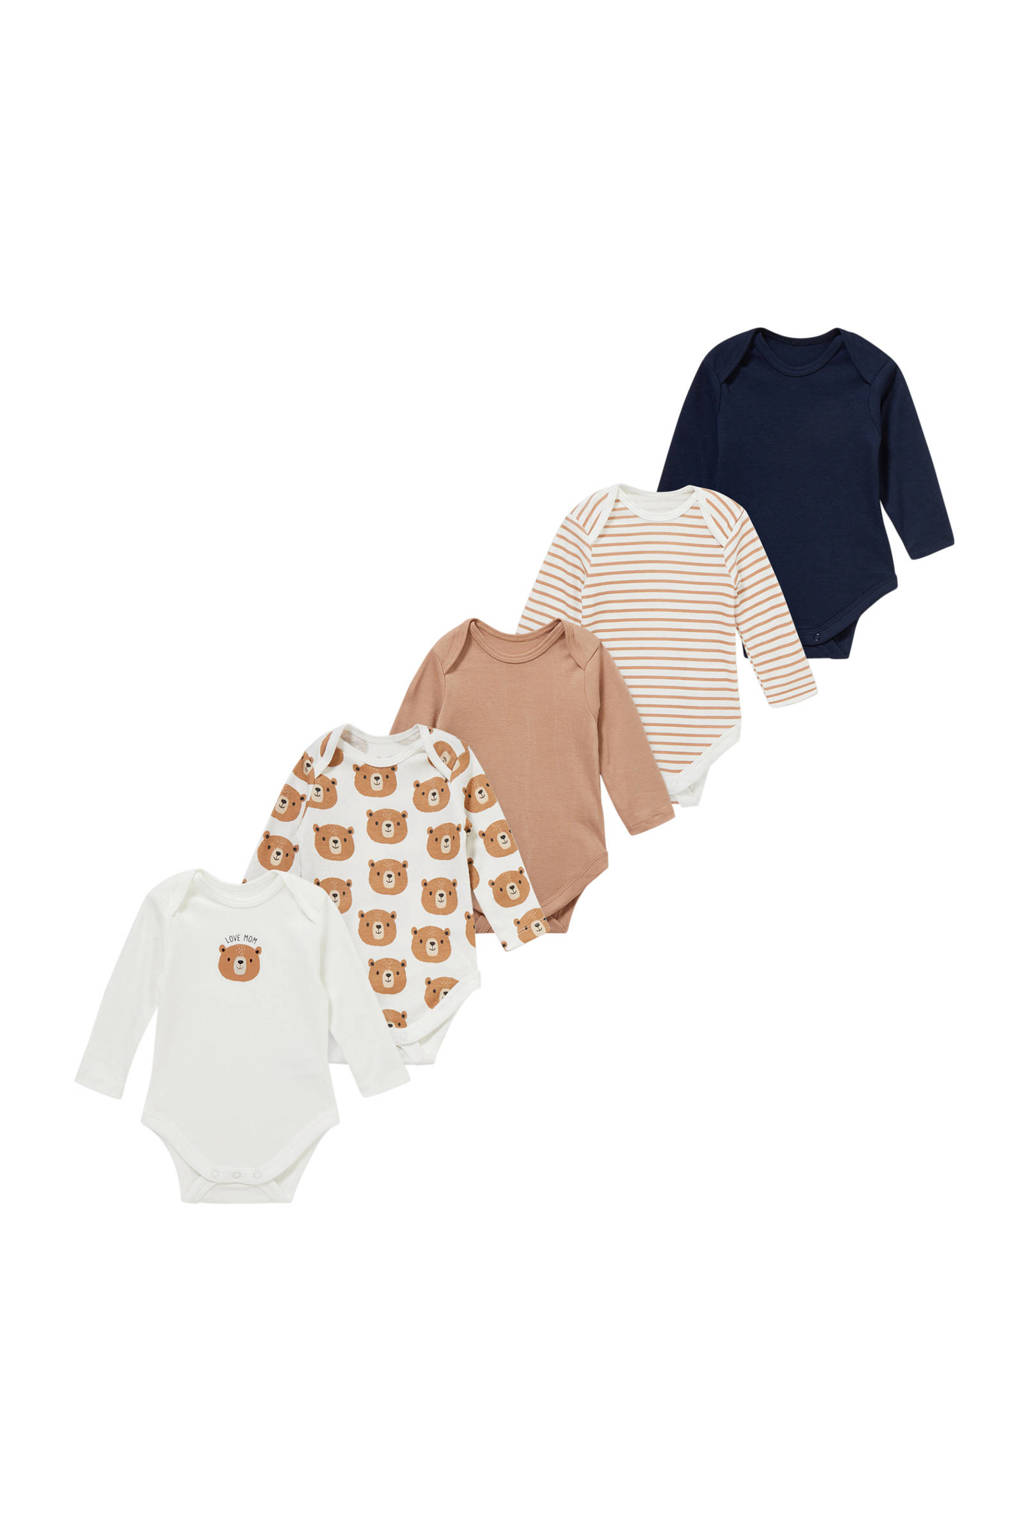 C&A Baby Club romper - set van 5 ecru/bruin/donkerblauw, Ecru